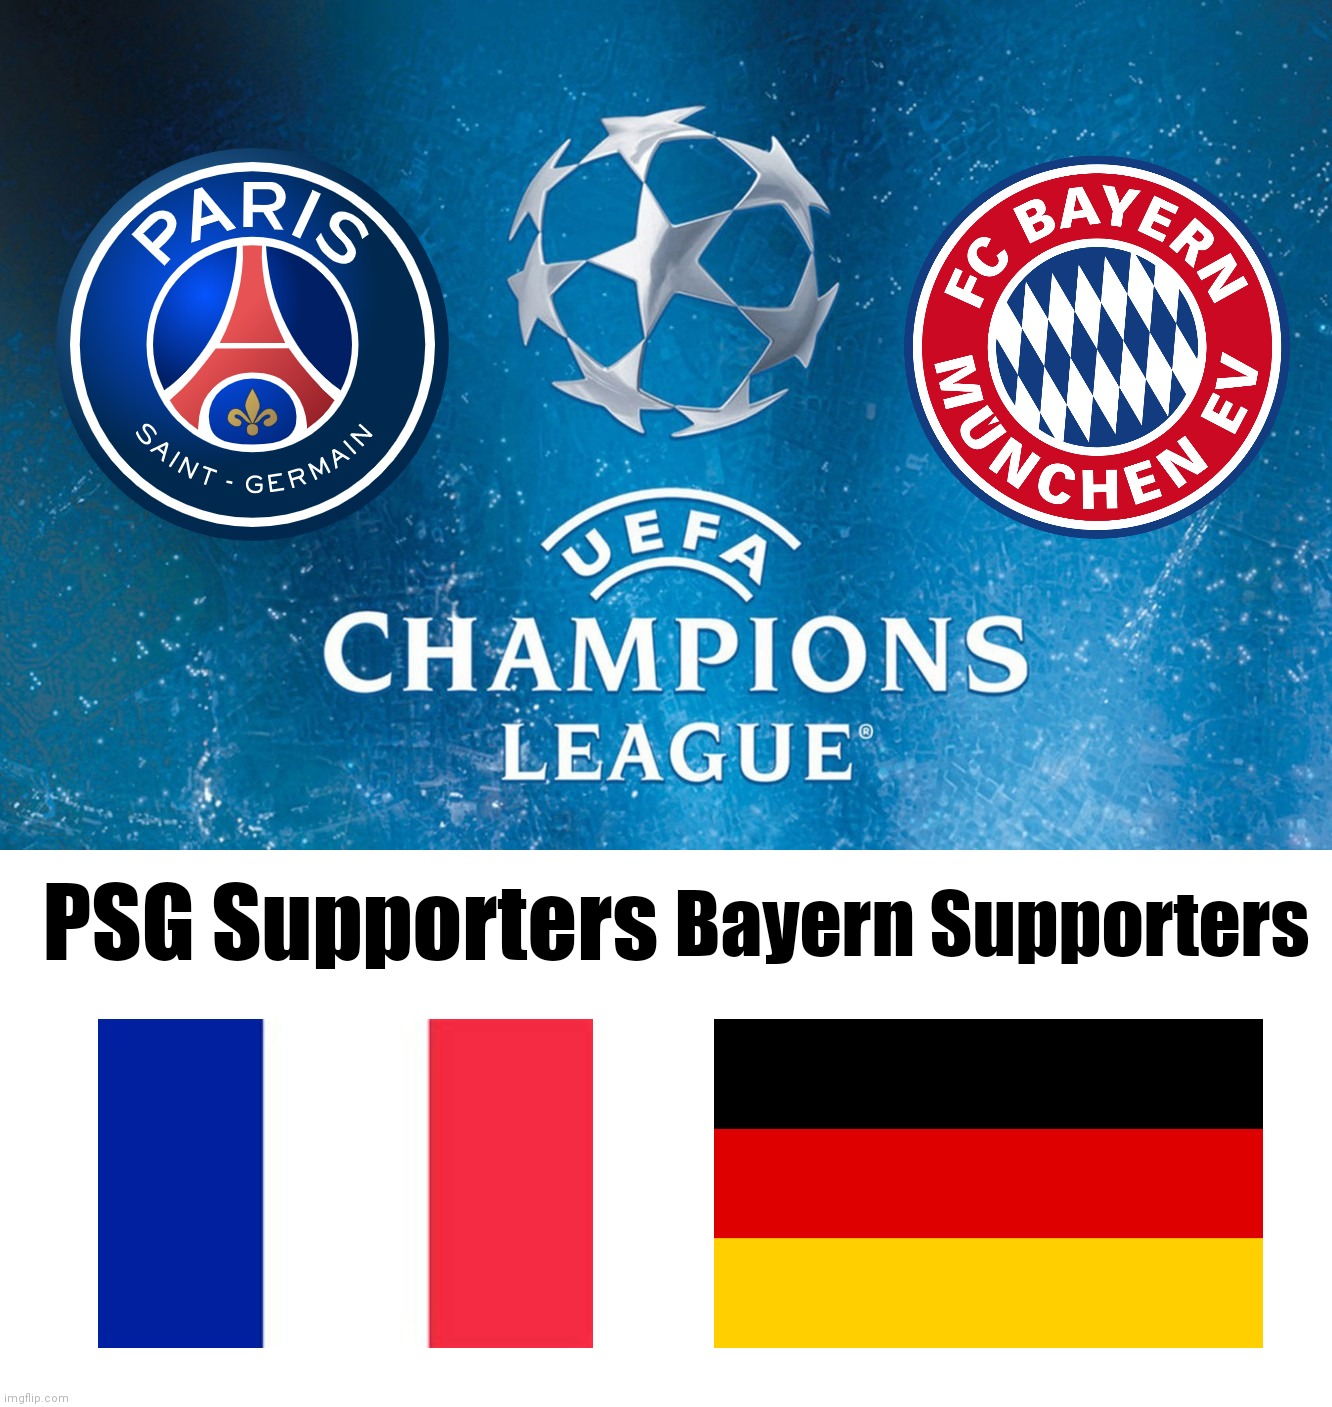 Psg Vs Bayern Munich The Uefa Champions League Final In Lisbon 2020 Imgflip